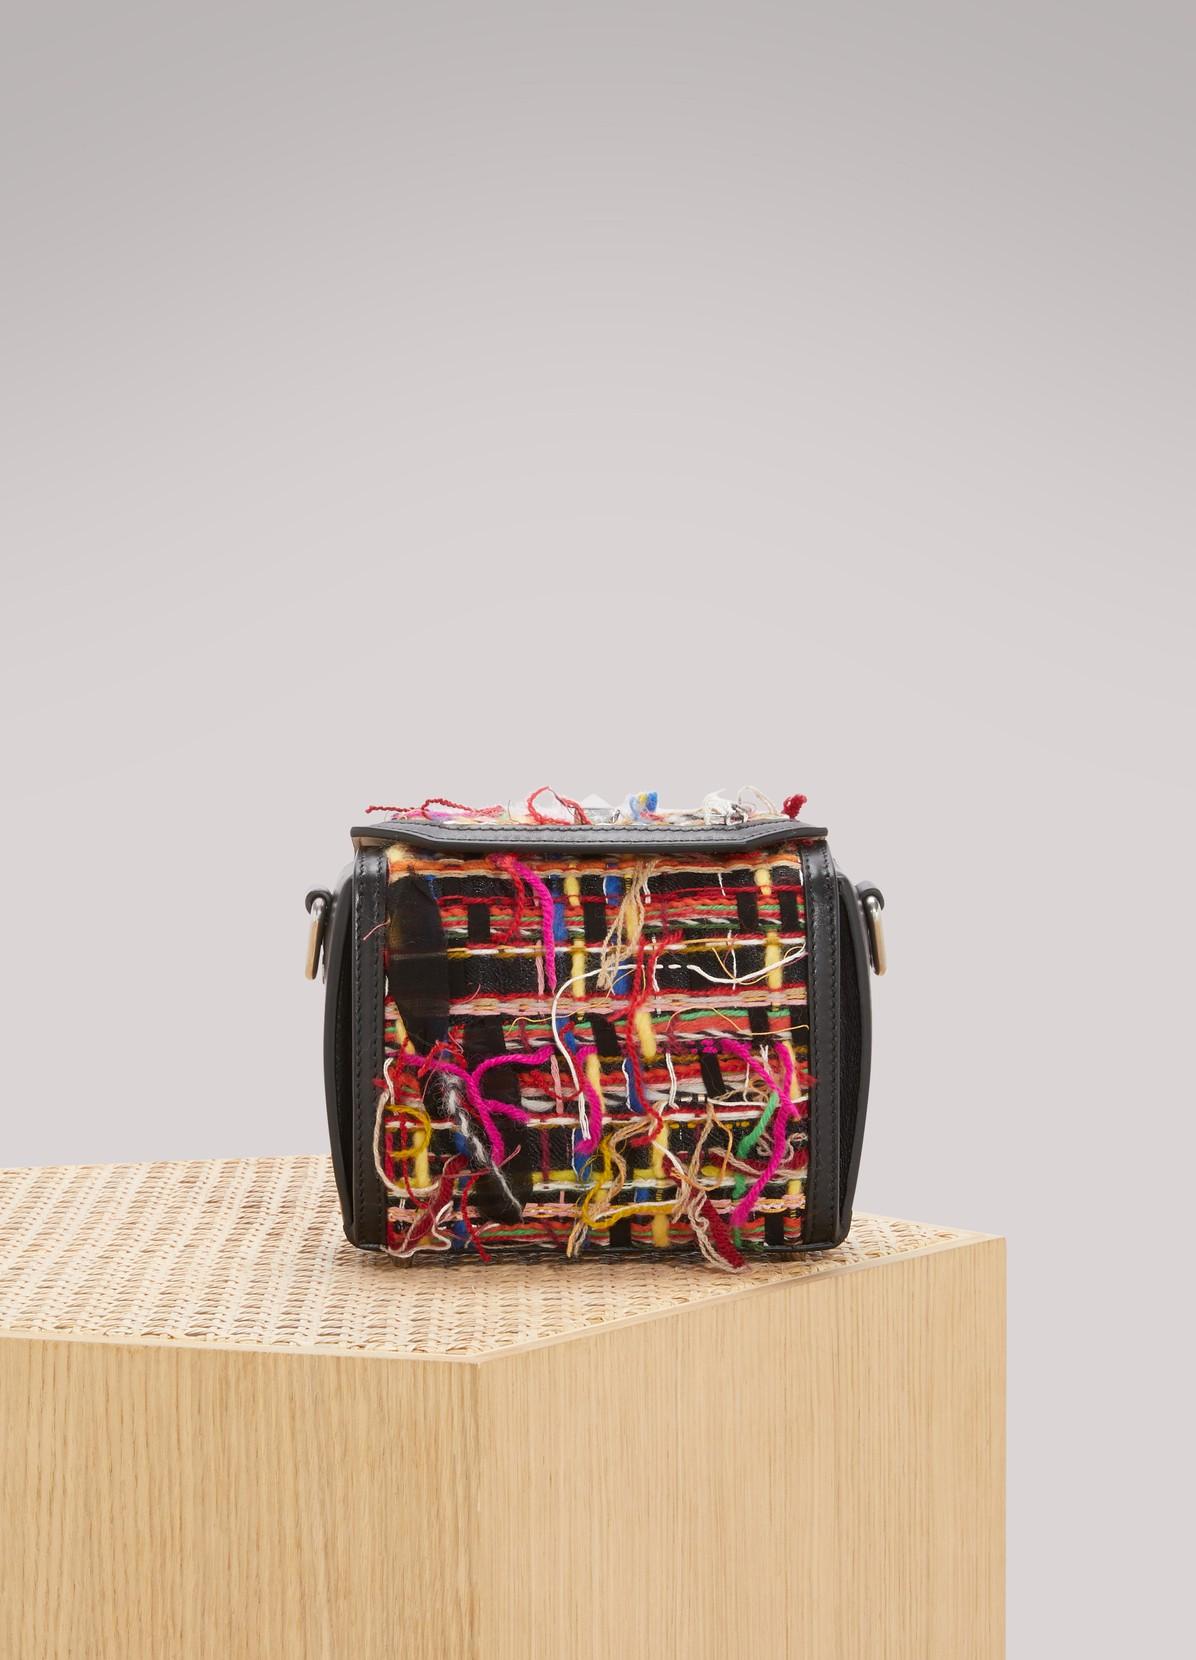 ALEXANDER MCQUEENLeather Box Bag 16